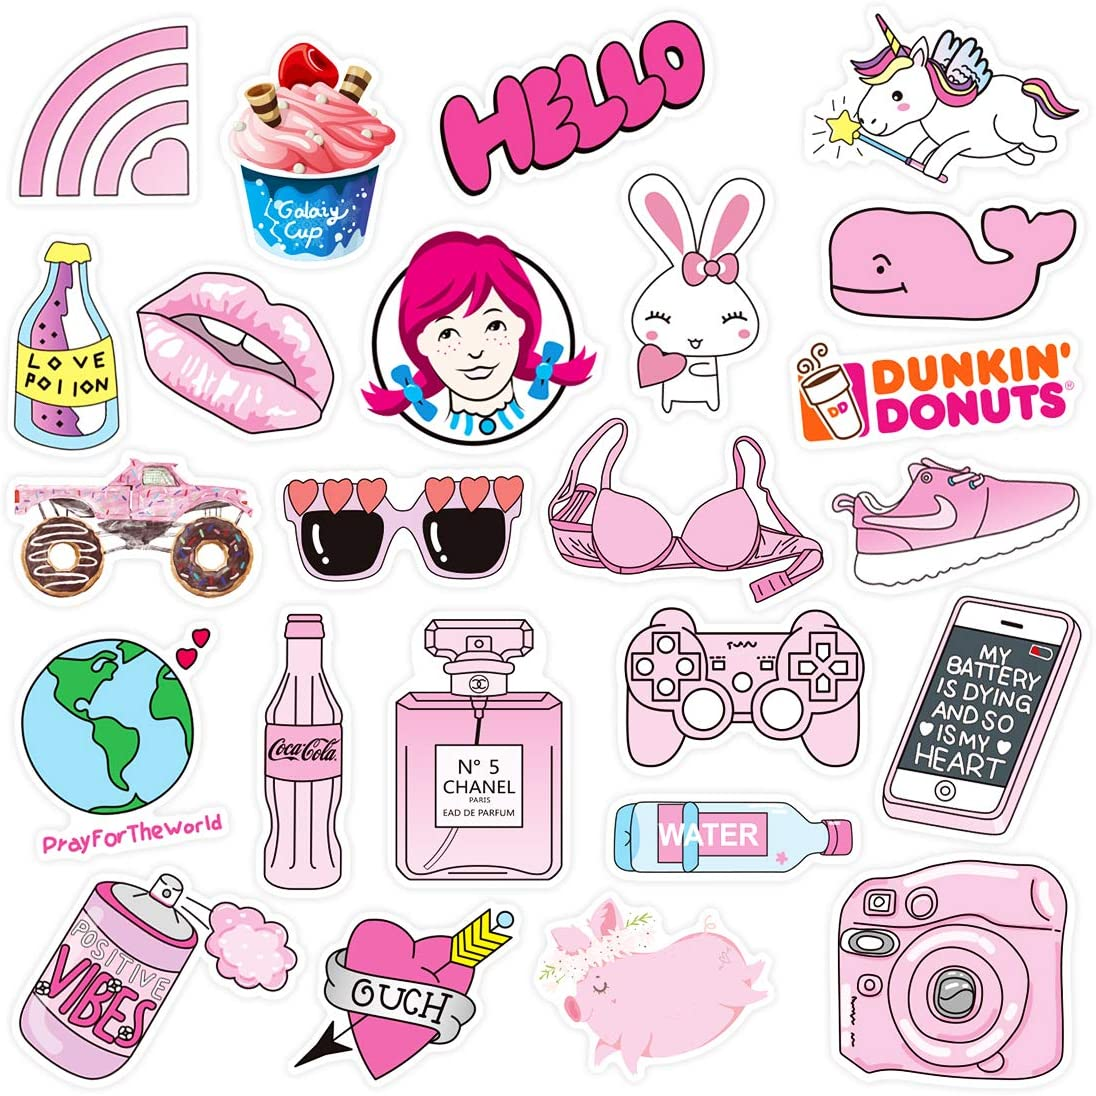 PPOGOO Stickers for Water Bottles, 50 Pcs,Vsco Girl Stickers, Decals Laptop, Waterproof Vinyl, Aesthetic,Trendy Stickers for Teens